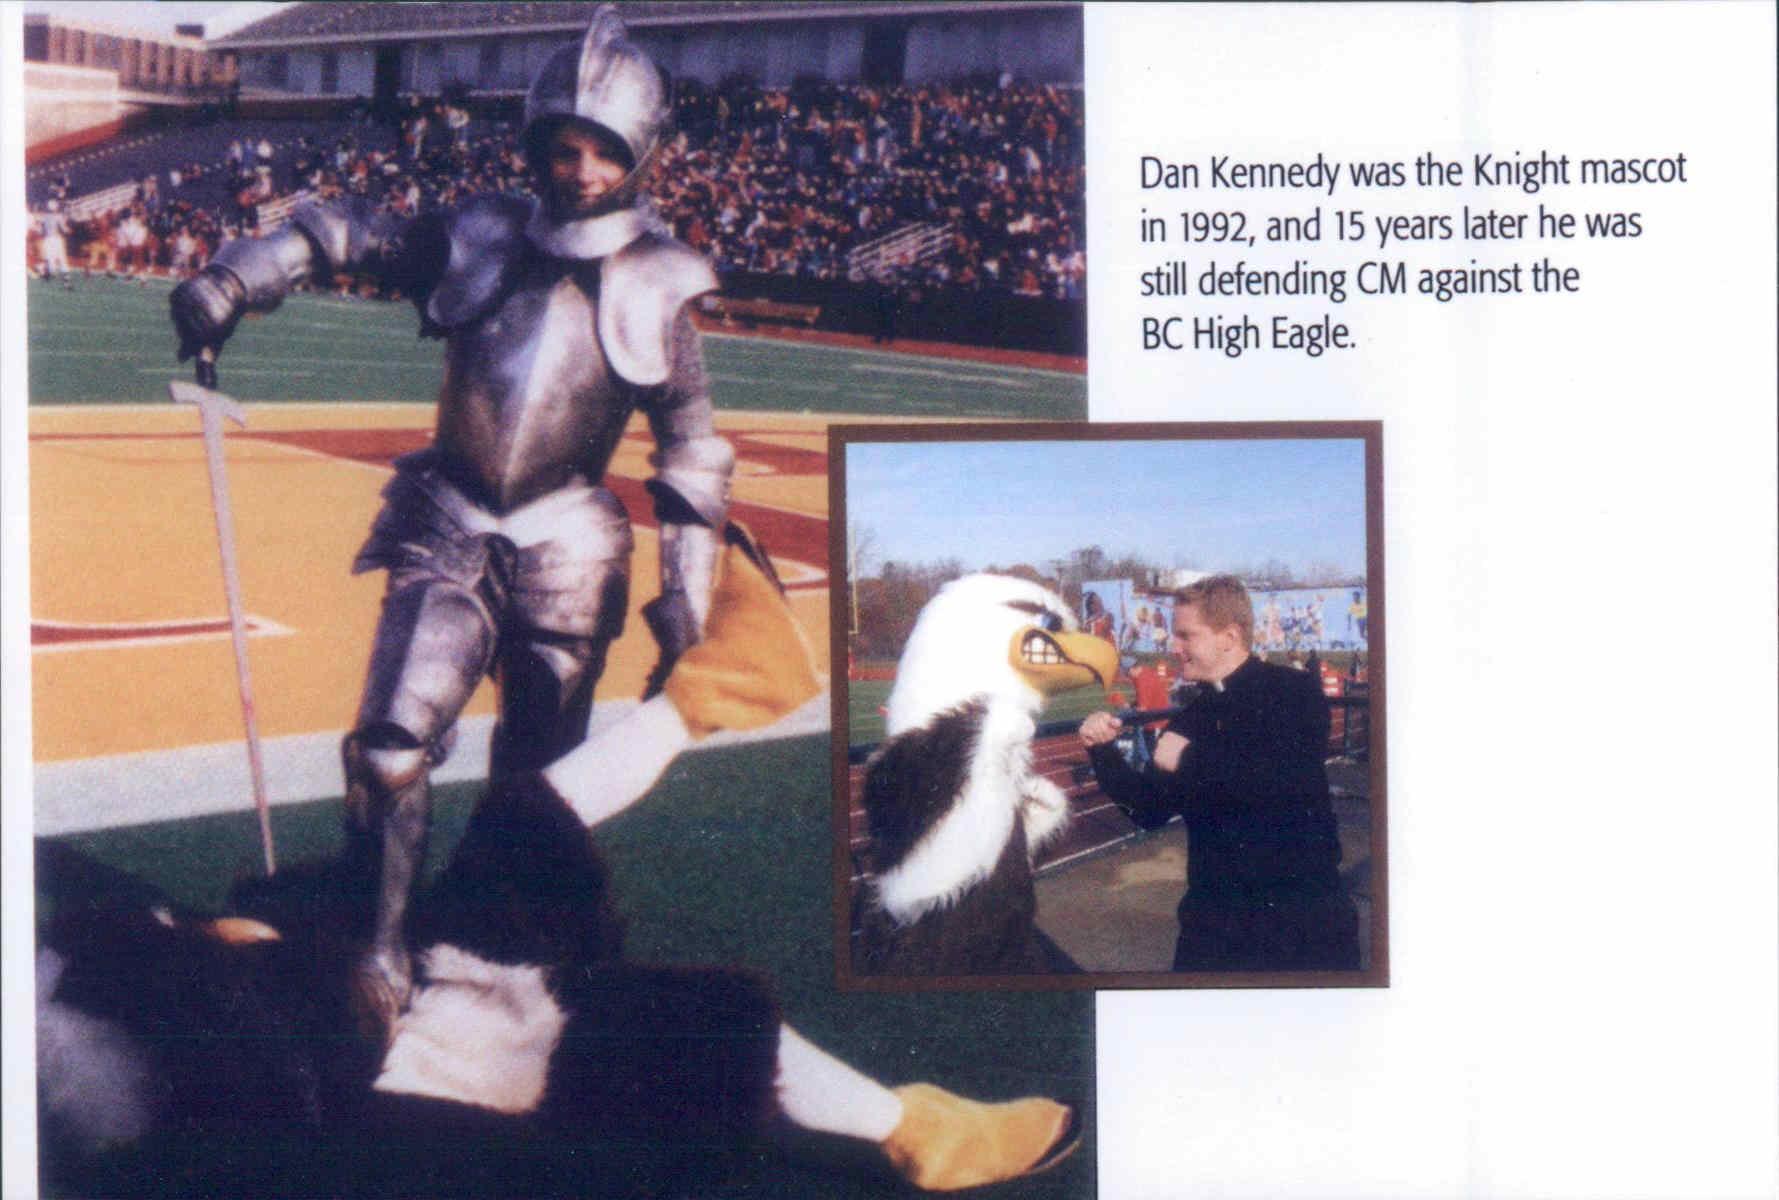 Mascot-Knight